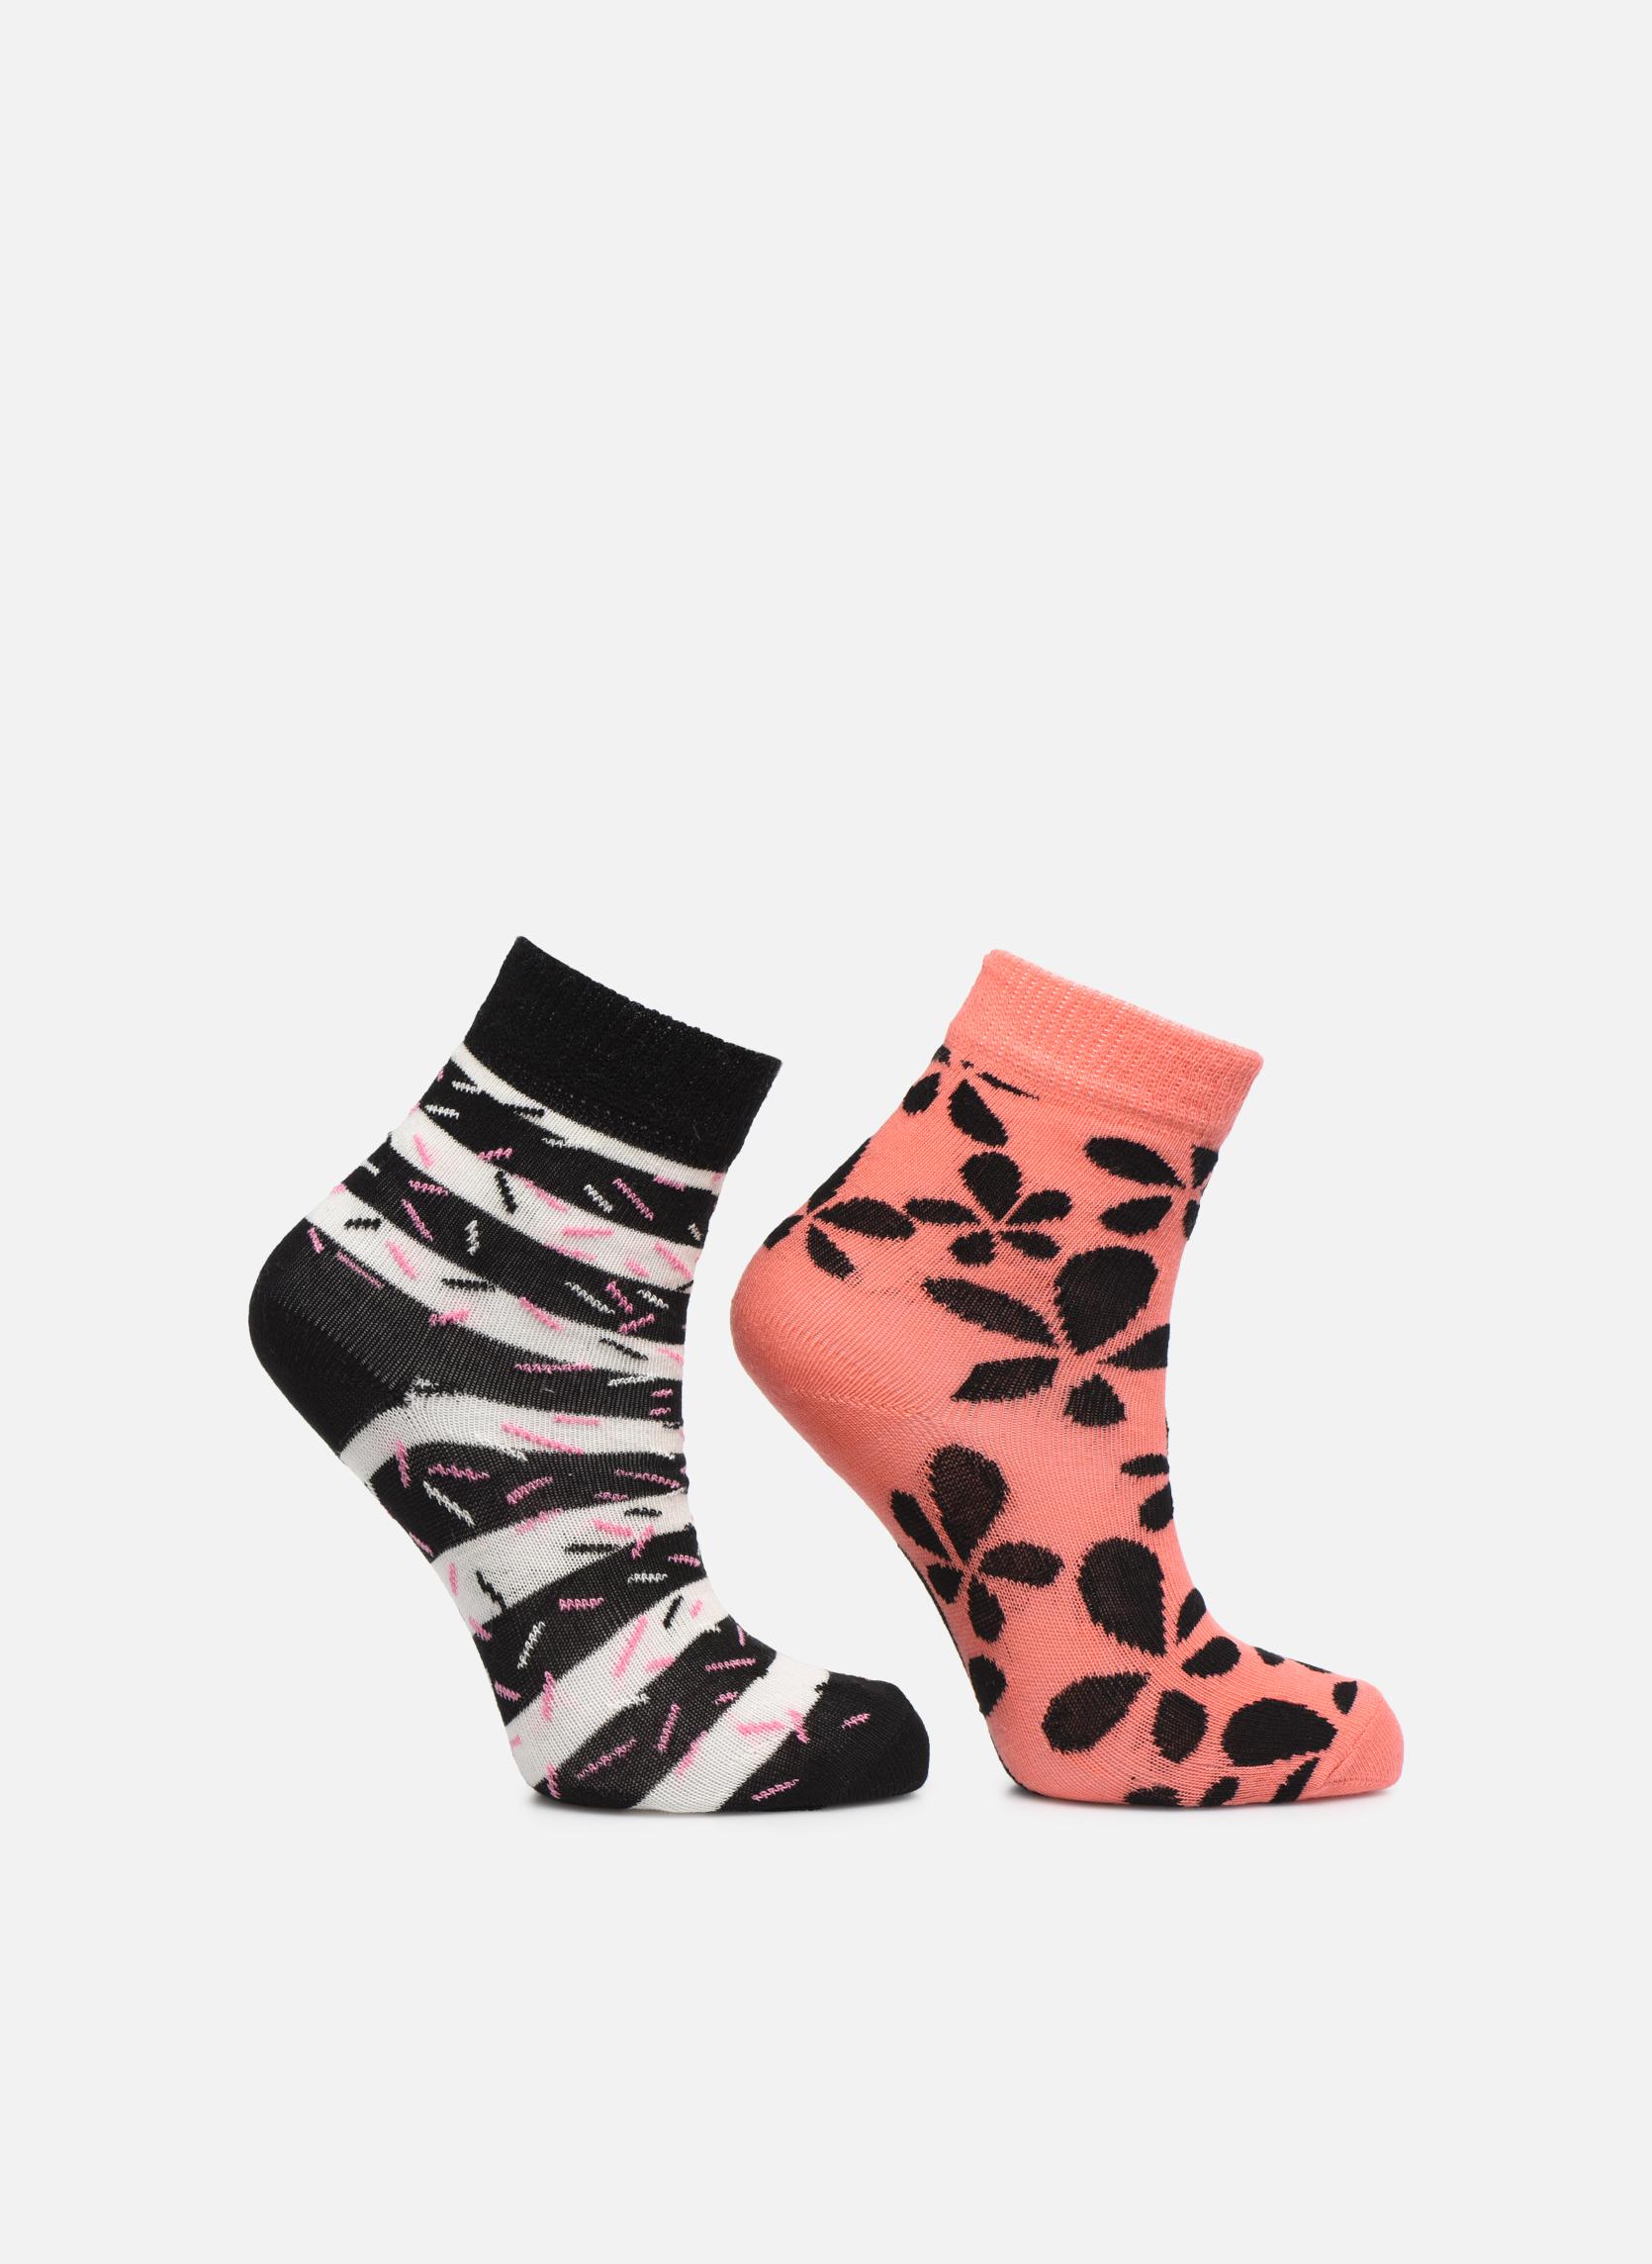 Socken & Strumpfhosen Accessoires Socken FLOWER 2er-Pack